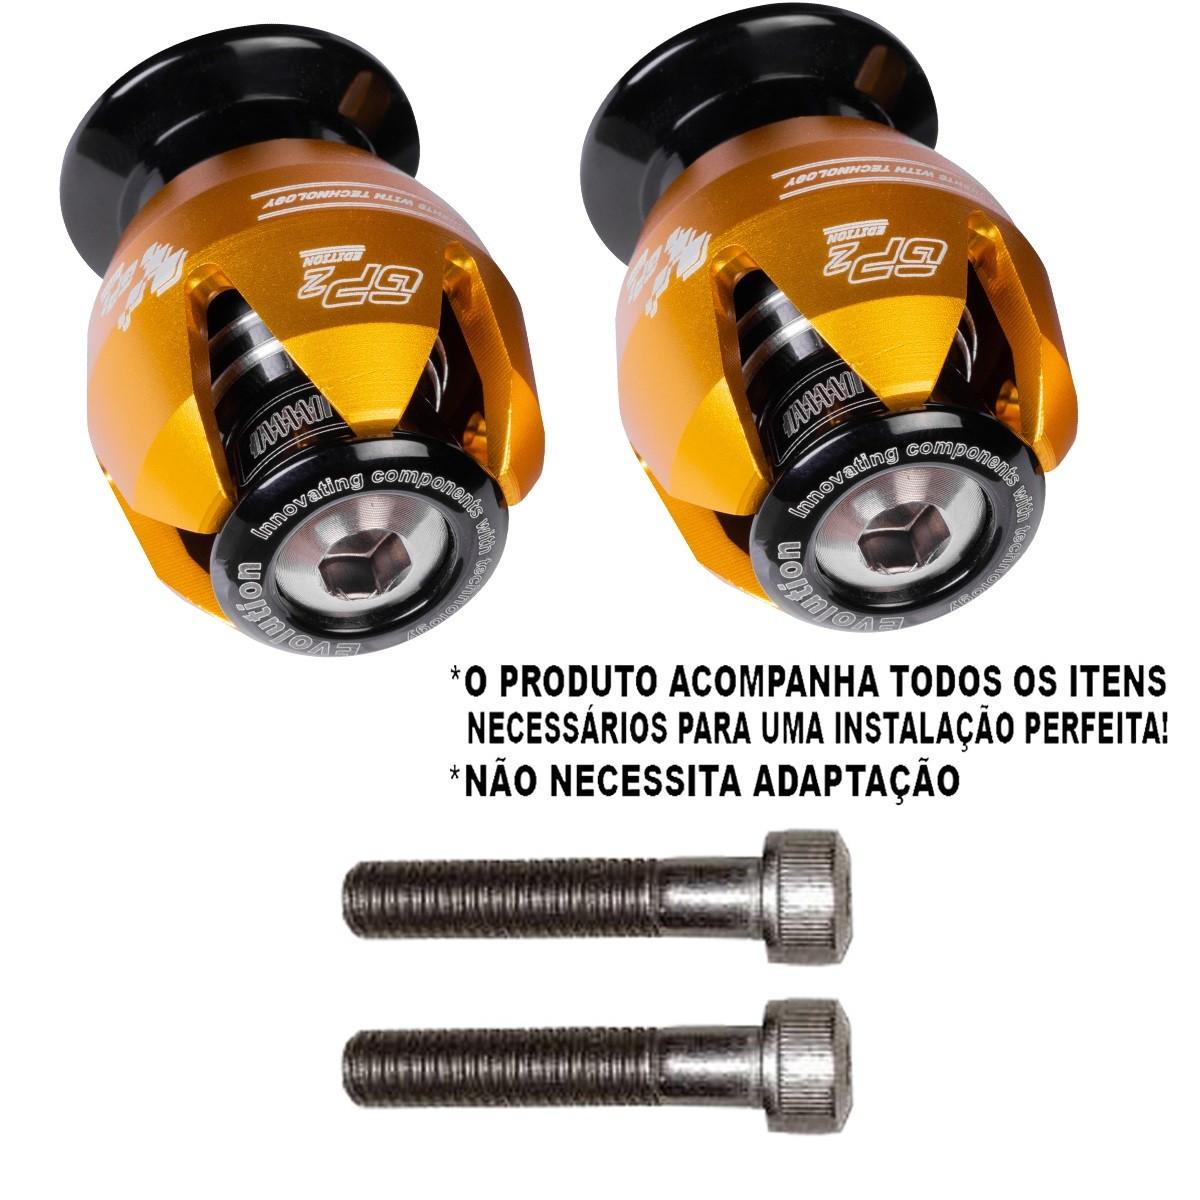 Slider traseiro ninja 300 2012 2013 2014 2015 2016 2017 balança kawasaki gp2 edition